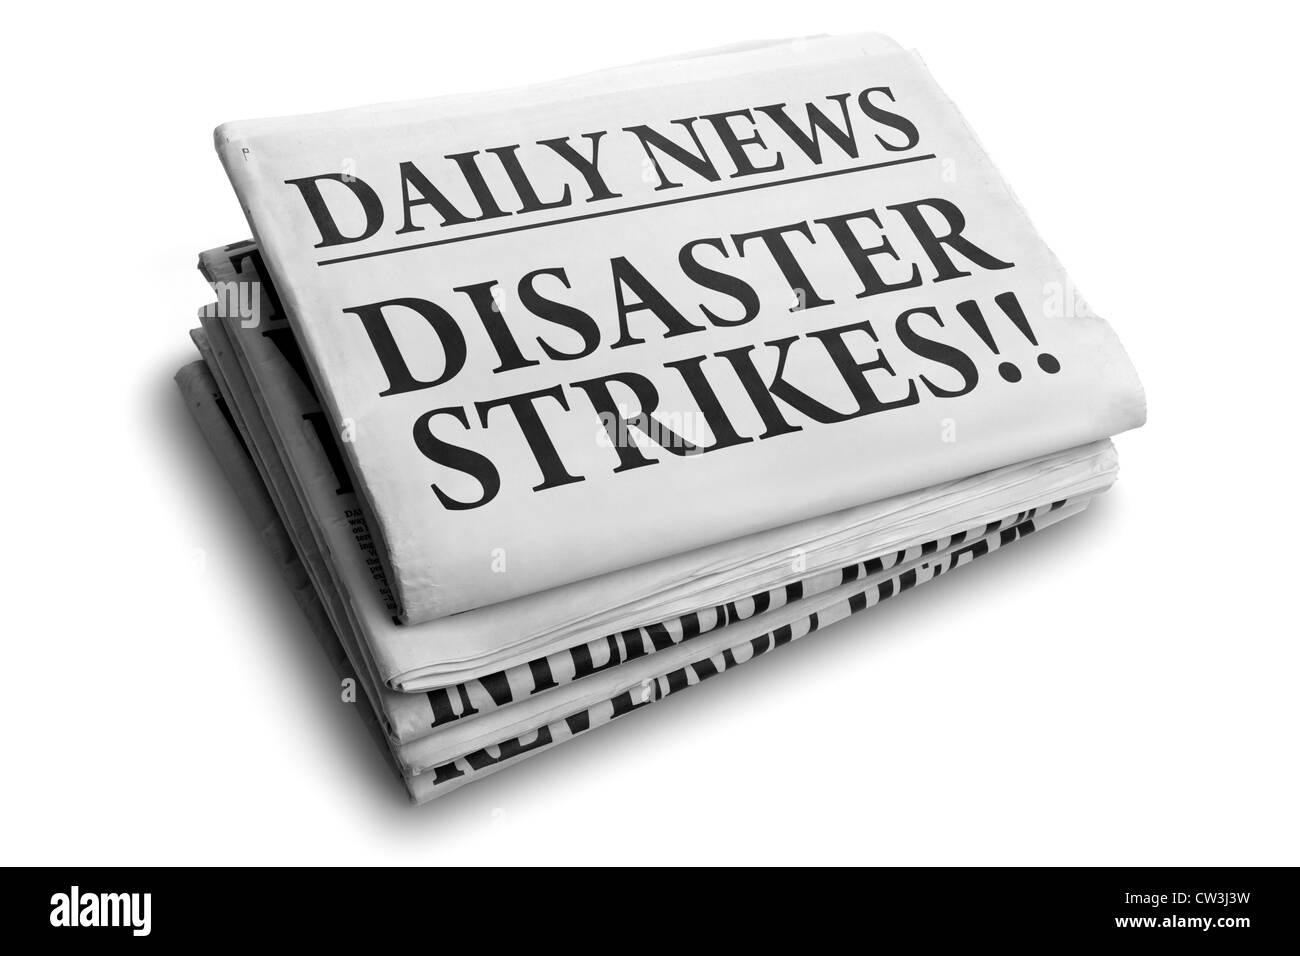 Disaster strikes daily newspaper headline - Stock Image